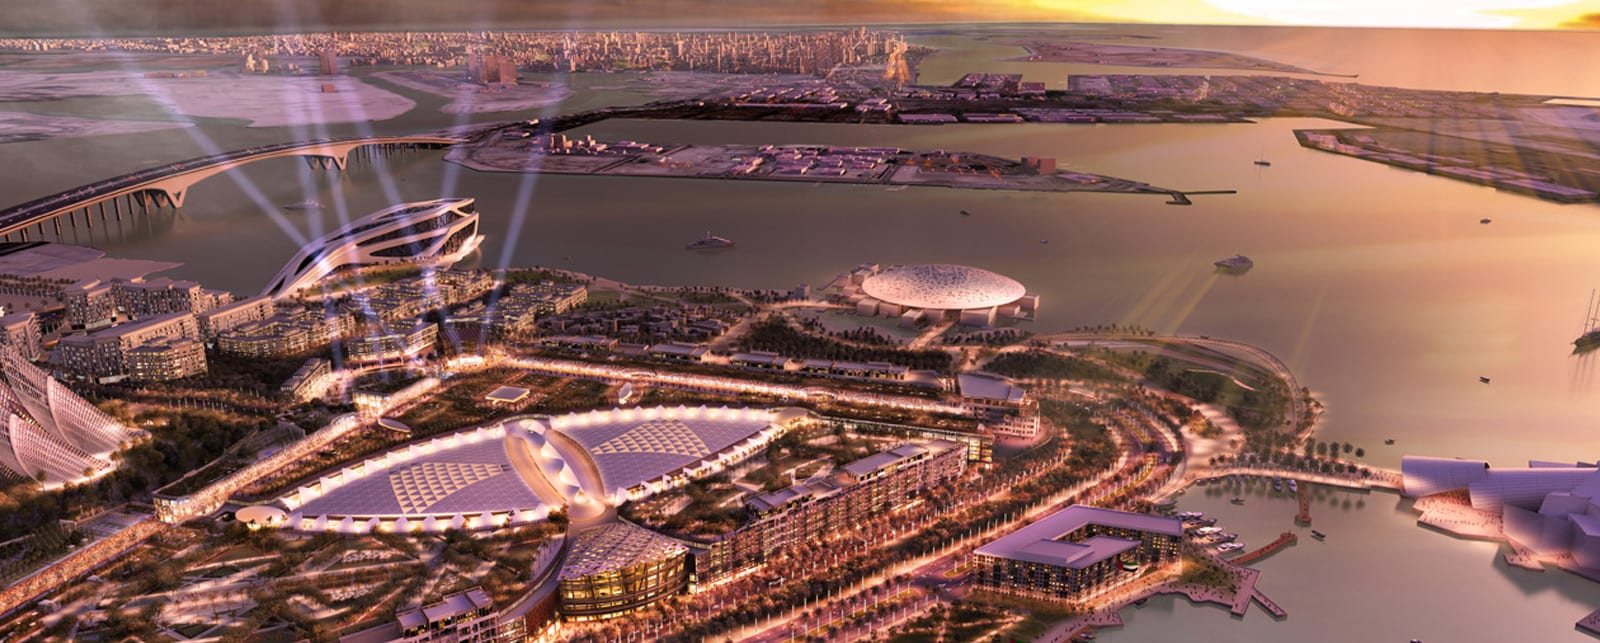 Hill International Wins Contract to Project Manage New Saadiyat Island Resort Development, Abu Dhabi